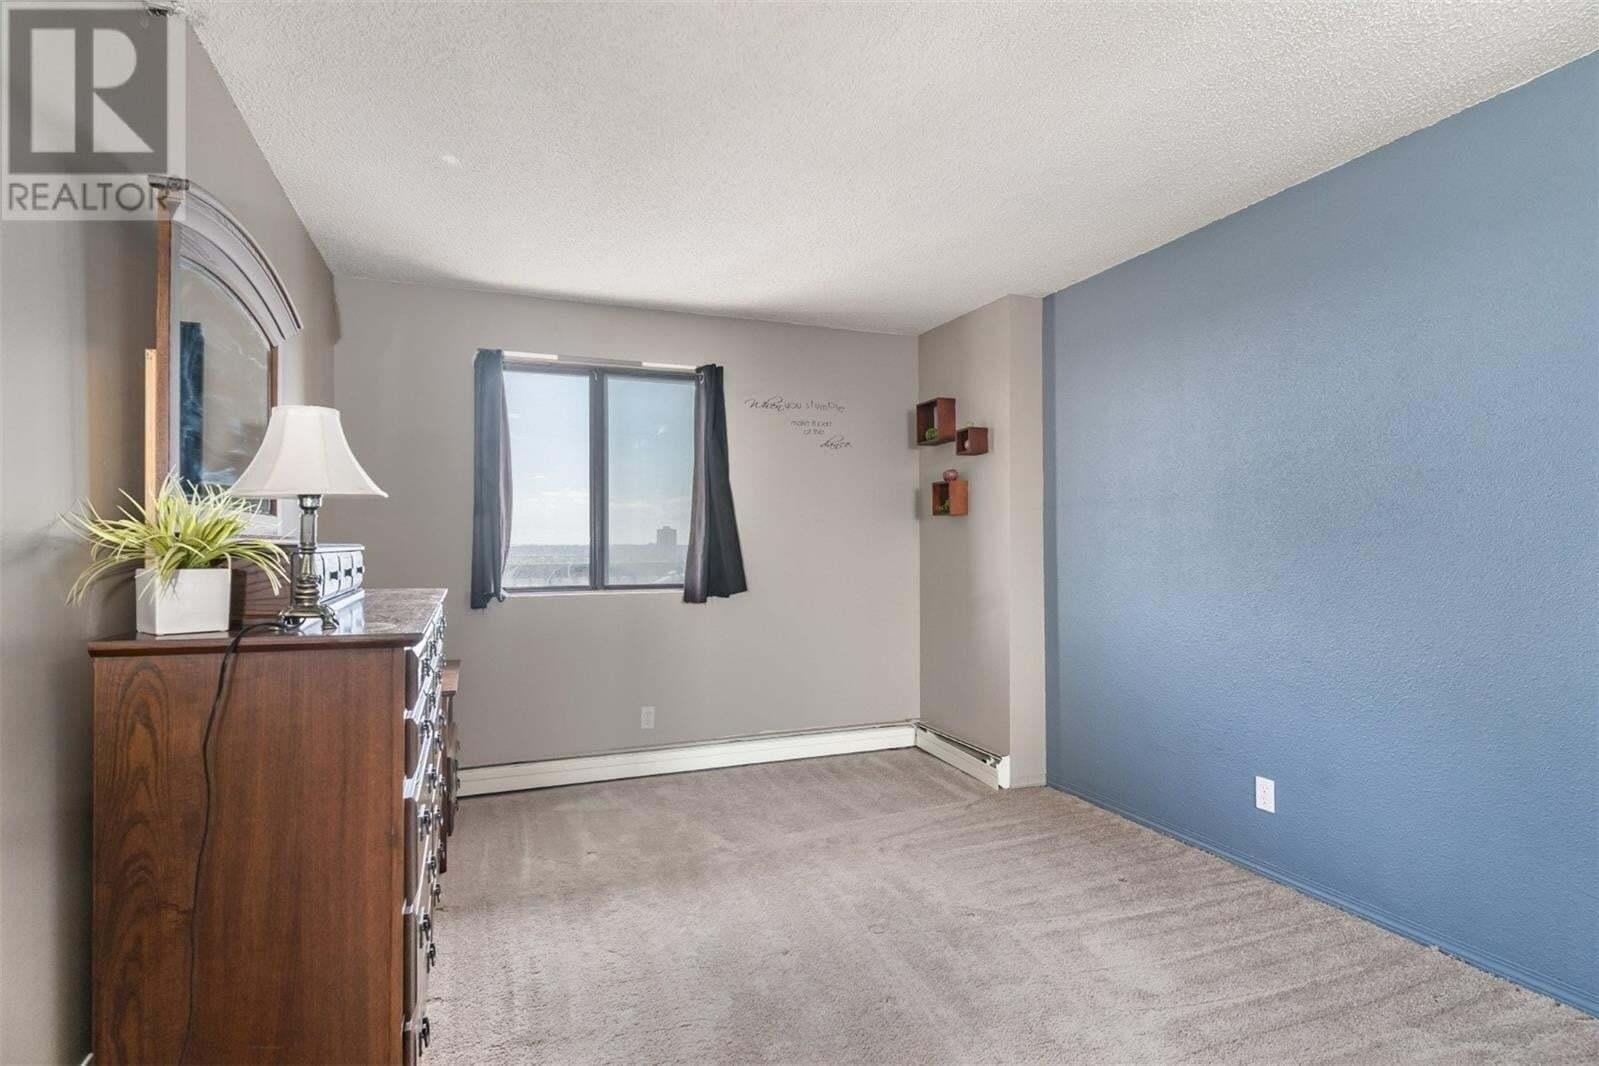 Condo for sale at 311 6th Ave N Unit 2404 Saskatoon Saskatchewan - MLS: SK818865